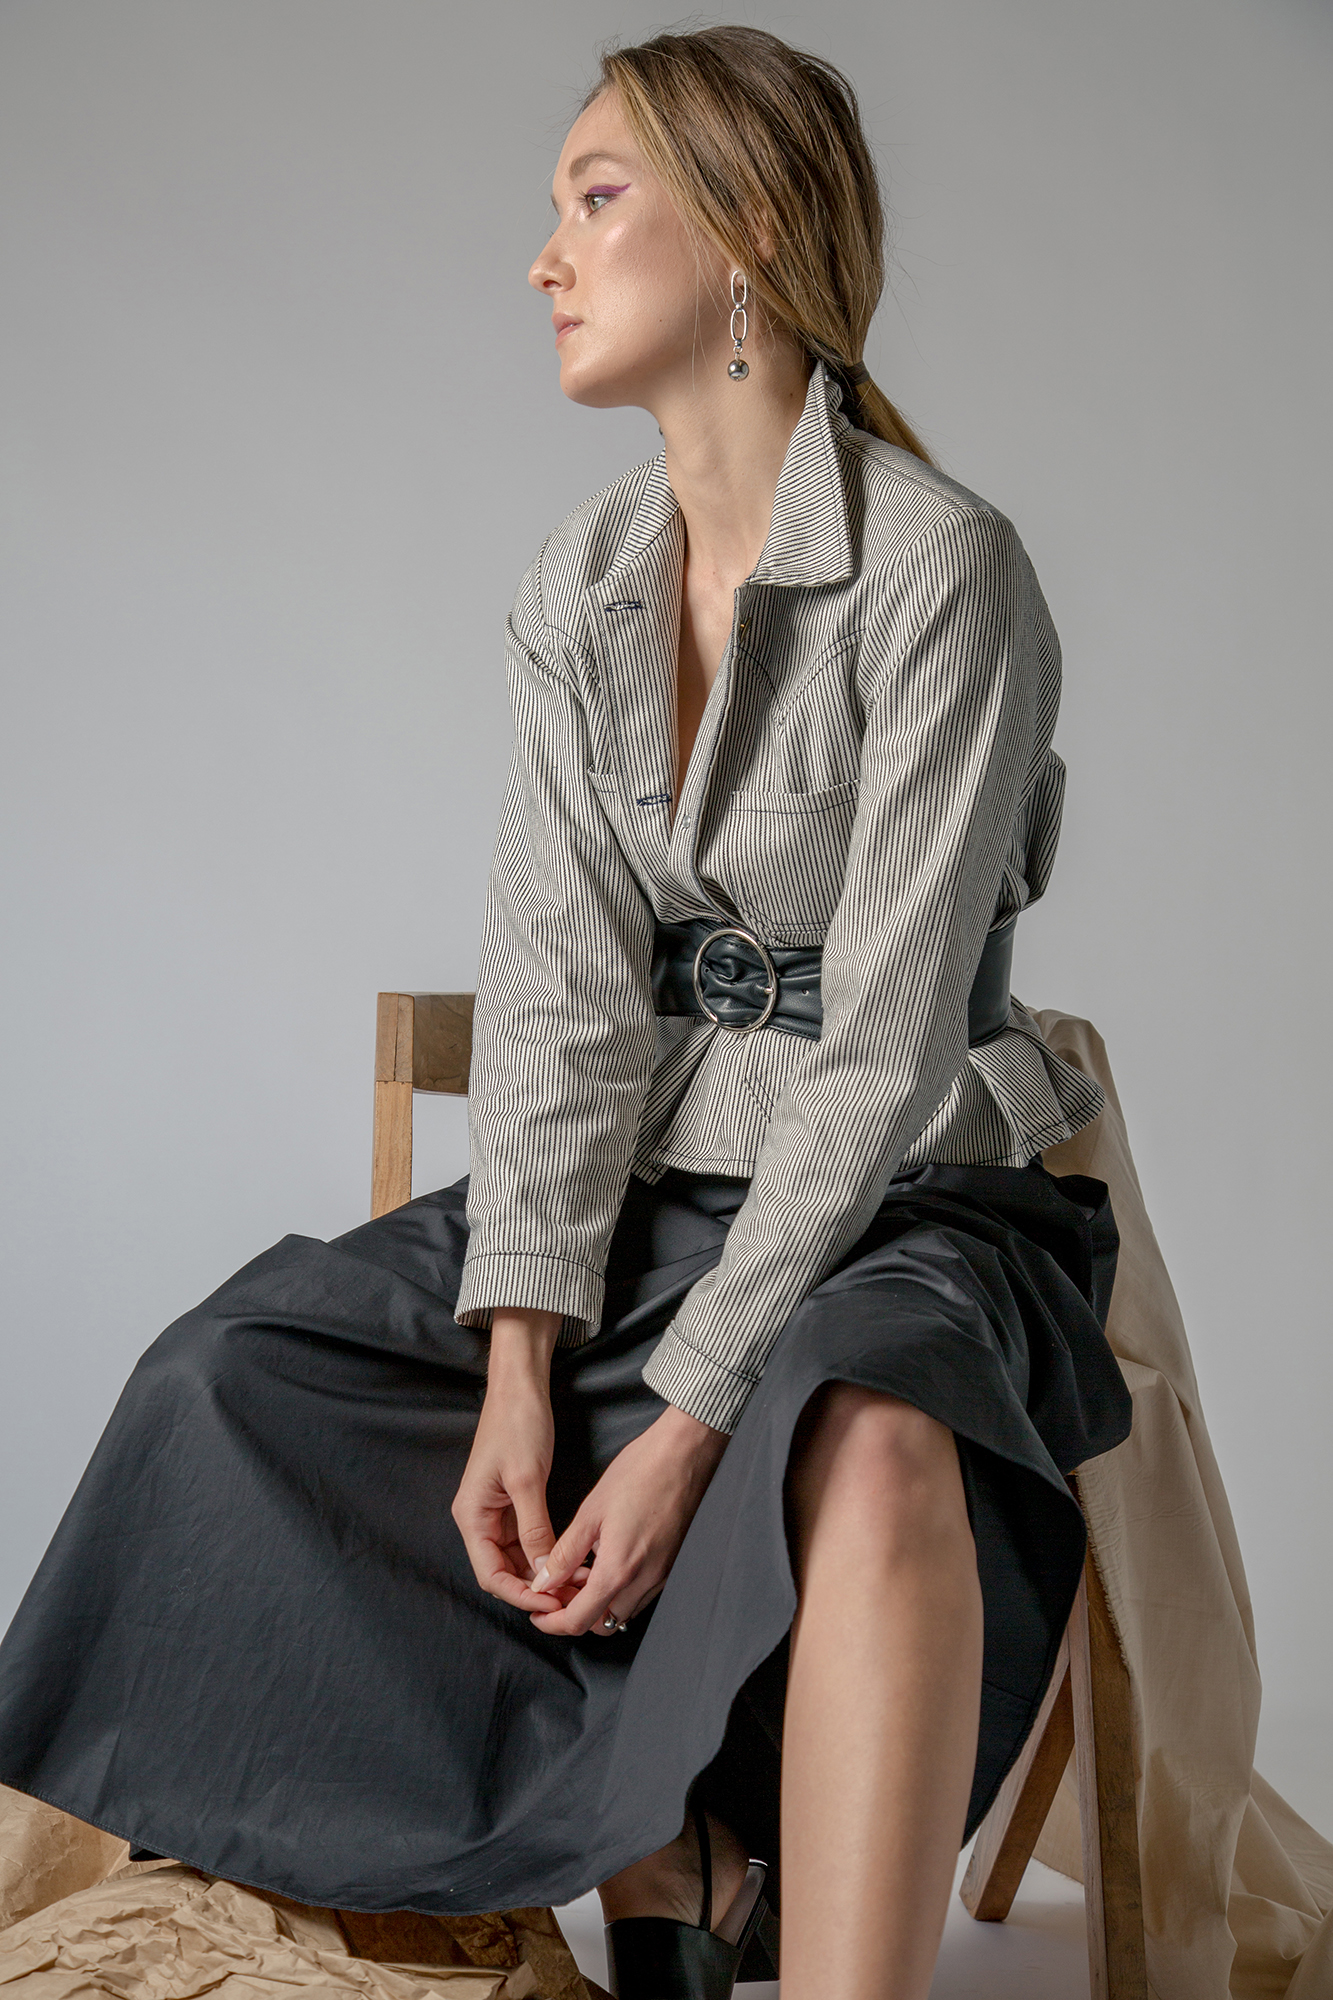 Theory skirt, Lykke Wullf jacket, Via Spiga shoes, Vintage earrings, Halogen belt.